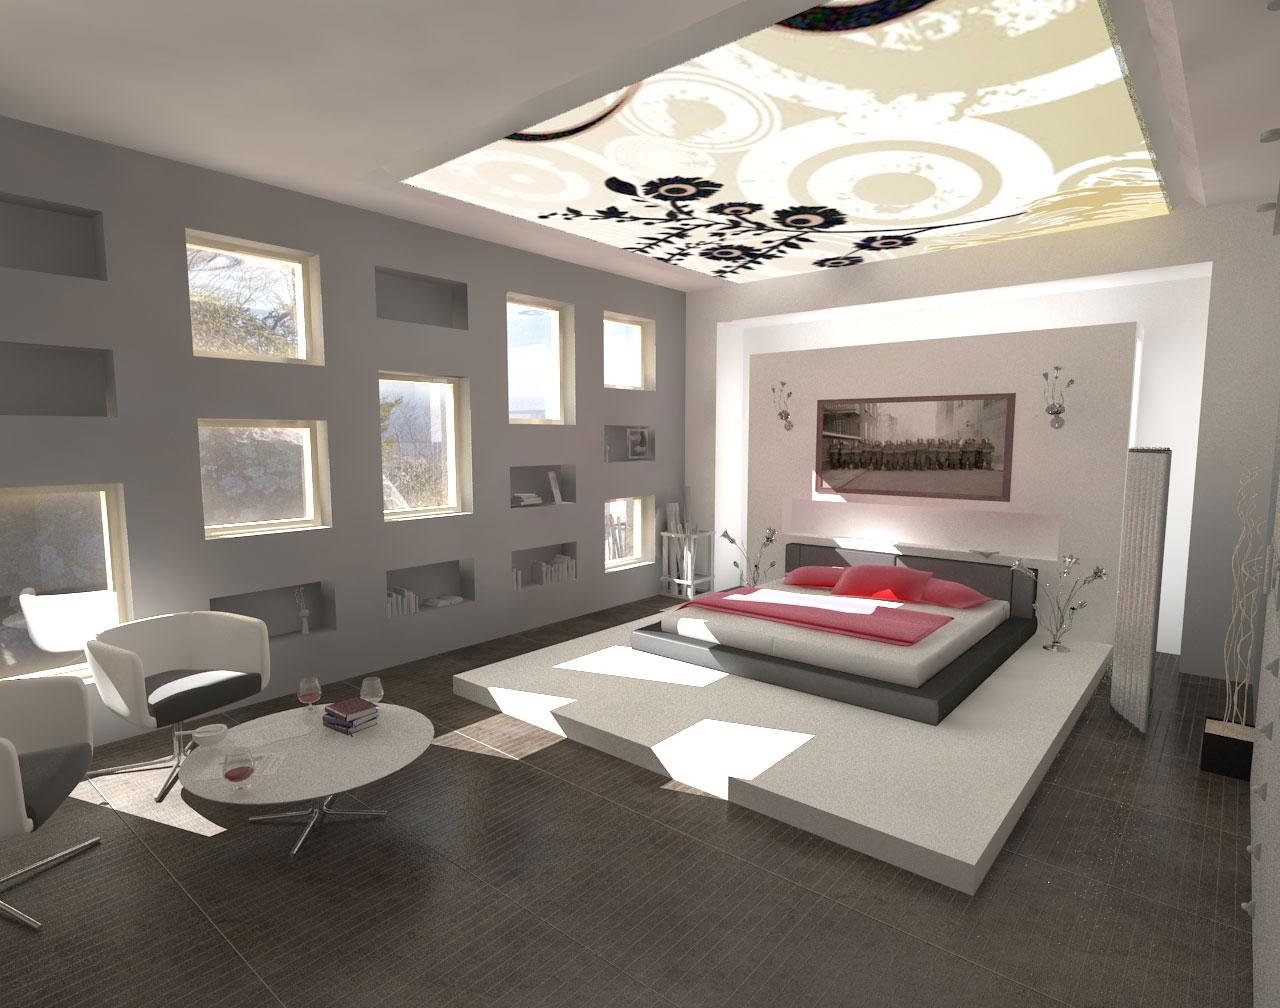 Home Interior Design Bedrooms